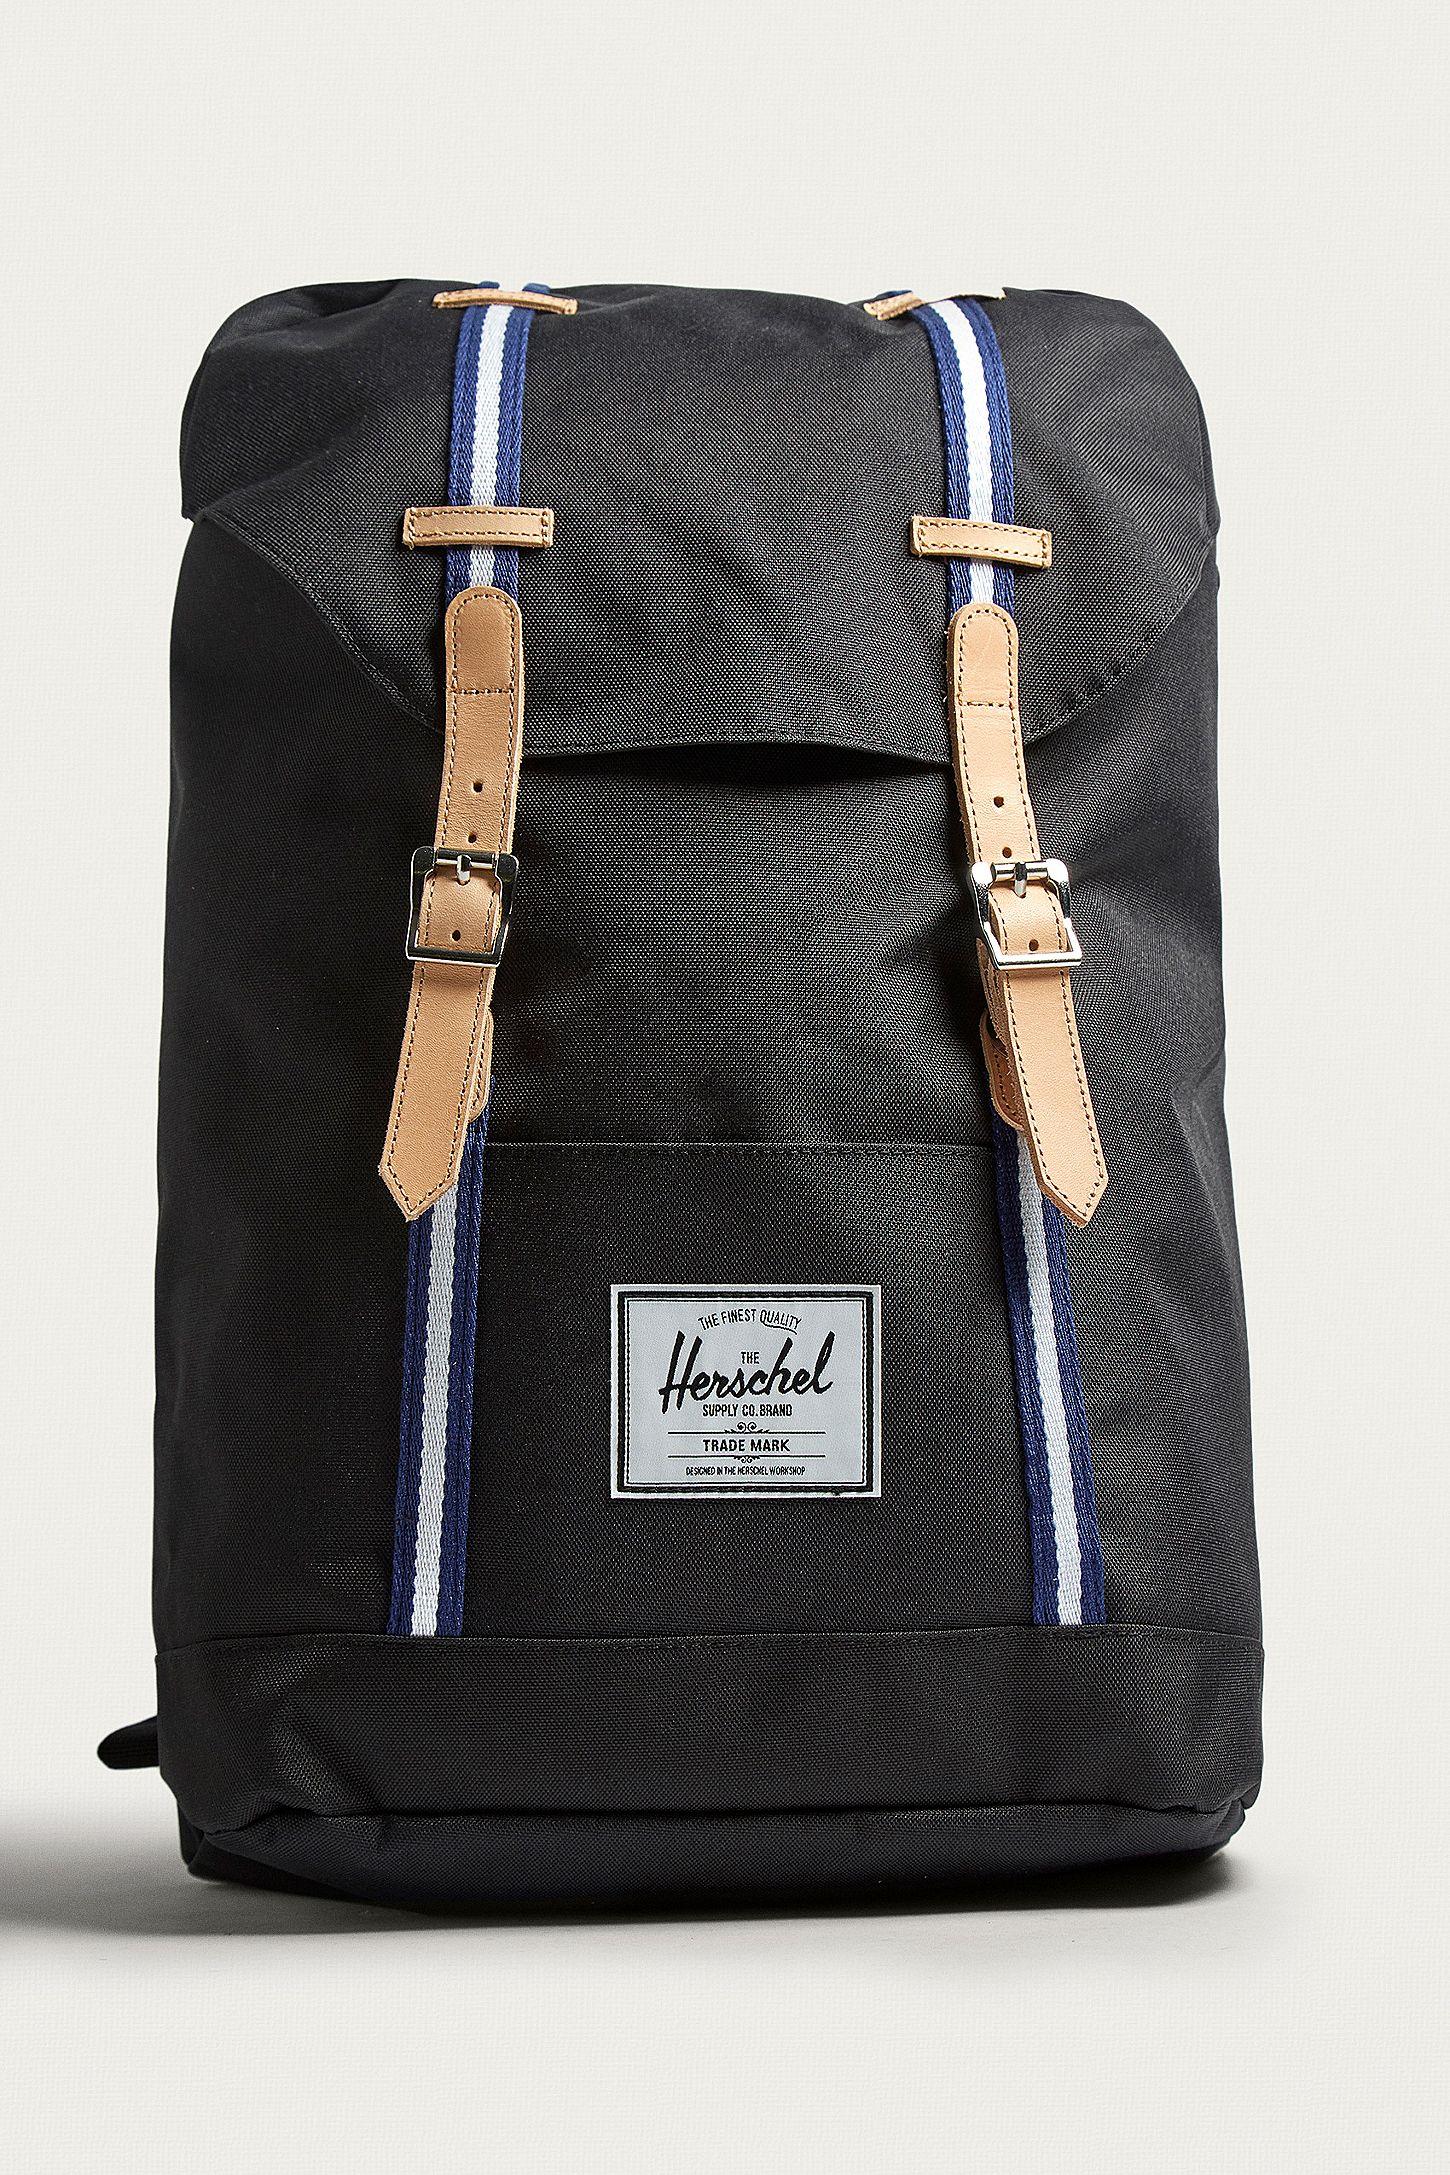 Herschel Supply Co. Retreat OFST Black and Blue Backpack   Urban ... b2d23e2025